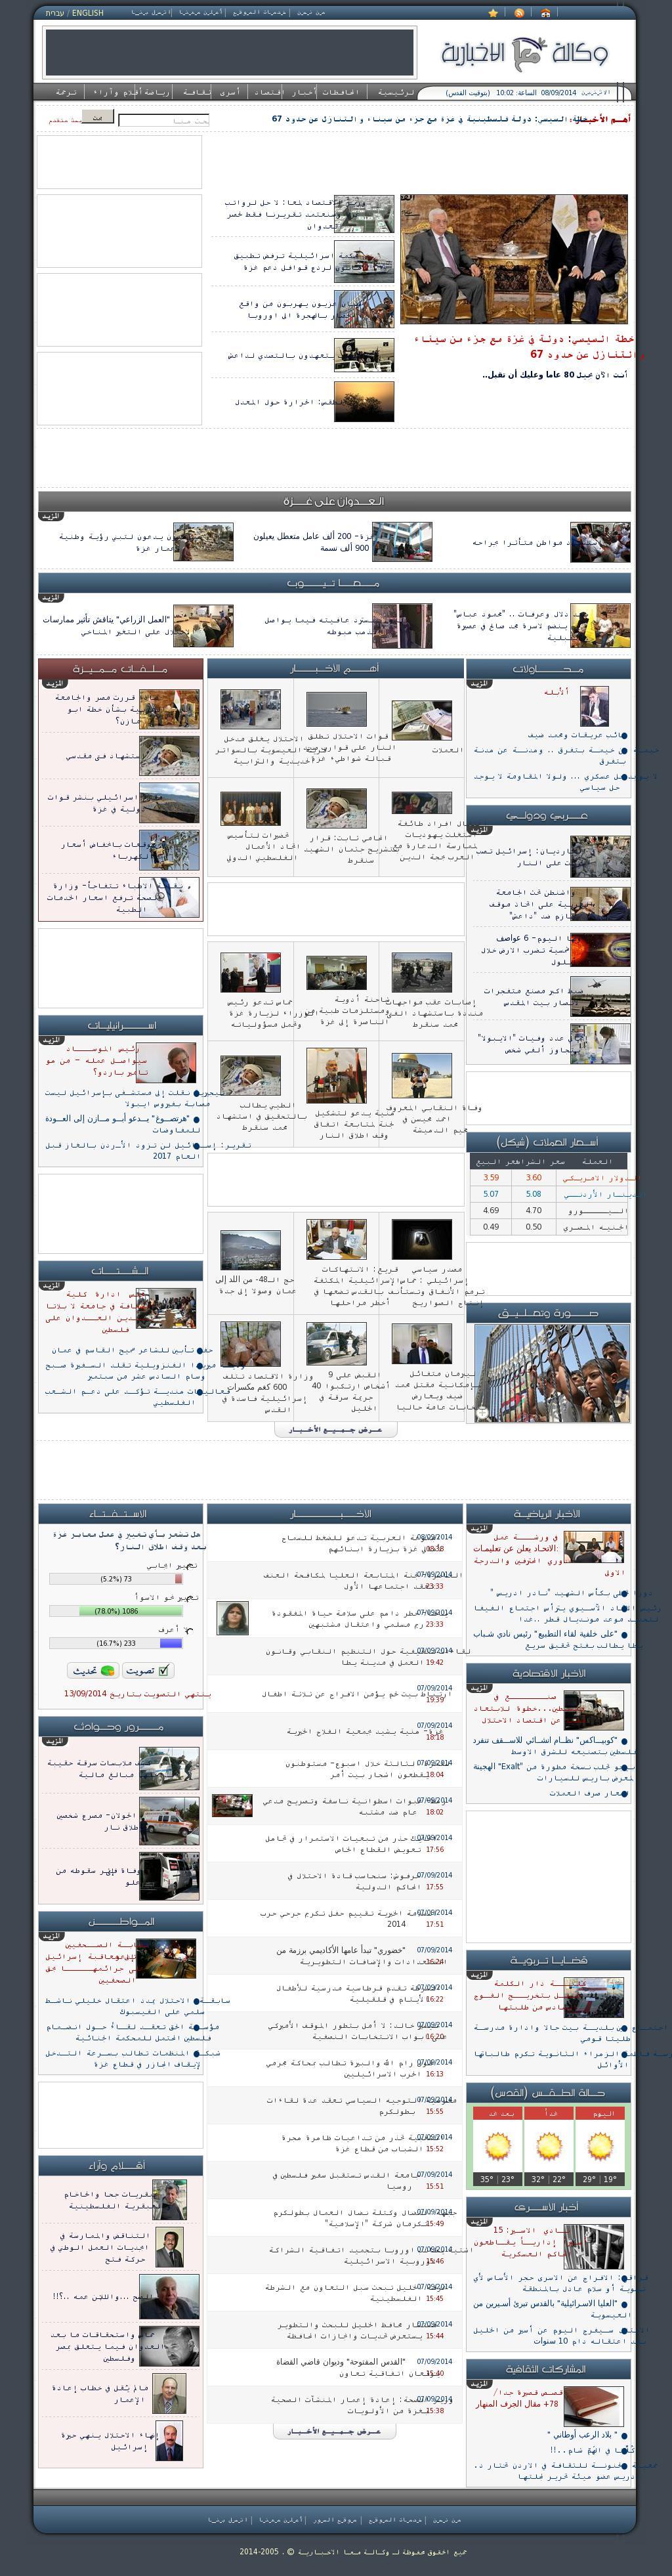 Ma'an News at Monday Sept. 8, 2014, 7:08 a.m. UTC